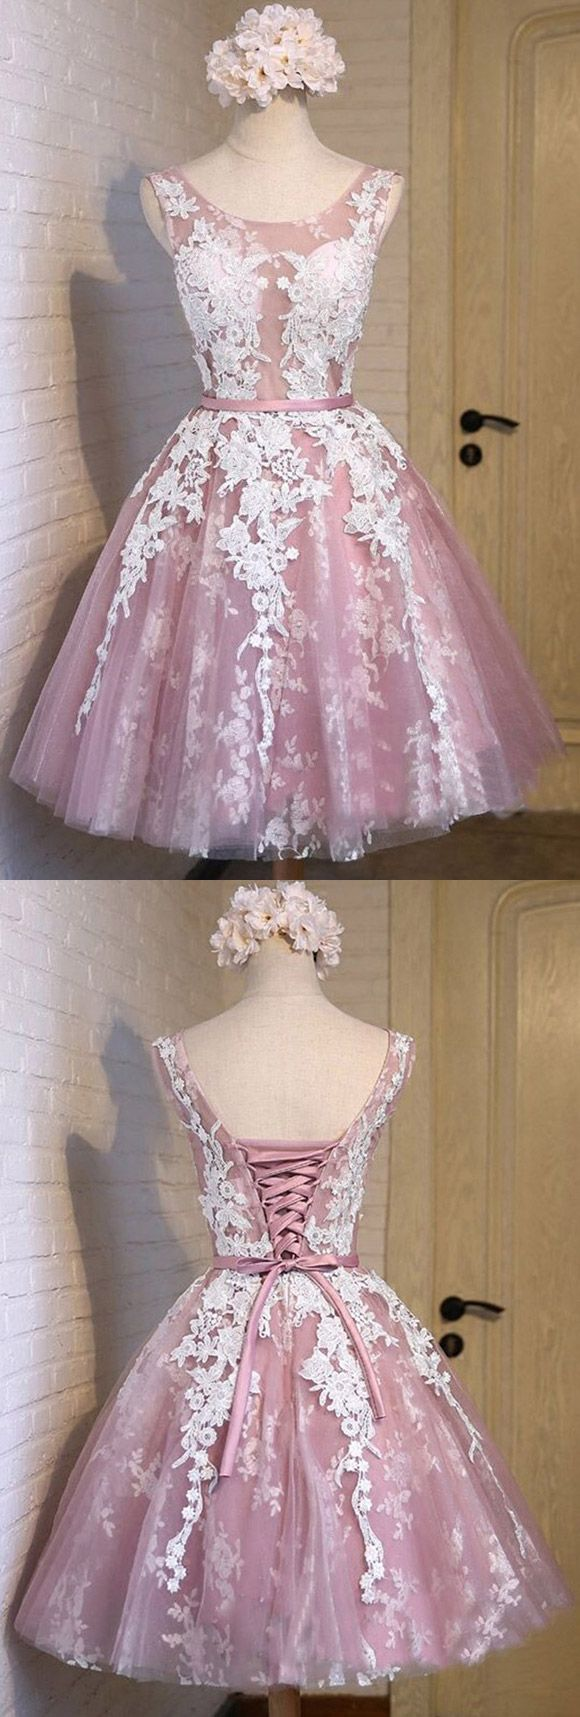 Short prom dresses lace pink cocktail dresses aline kneelength